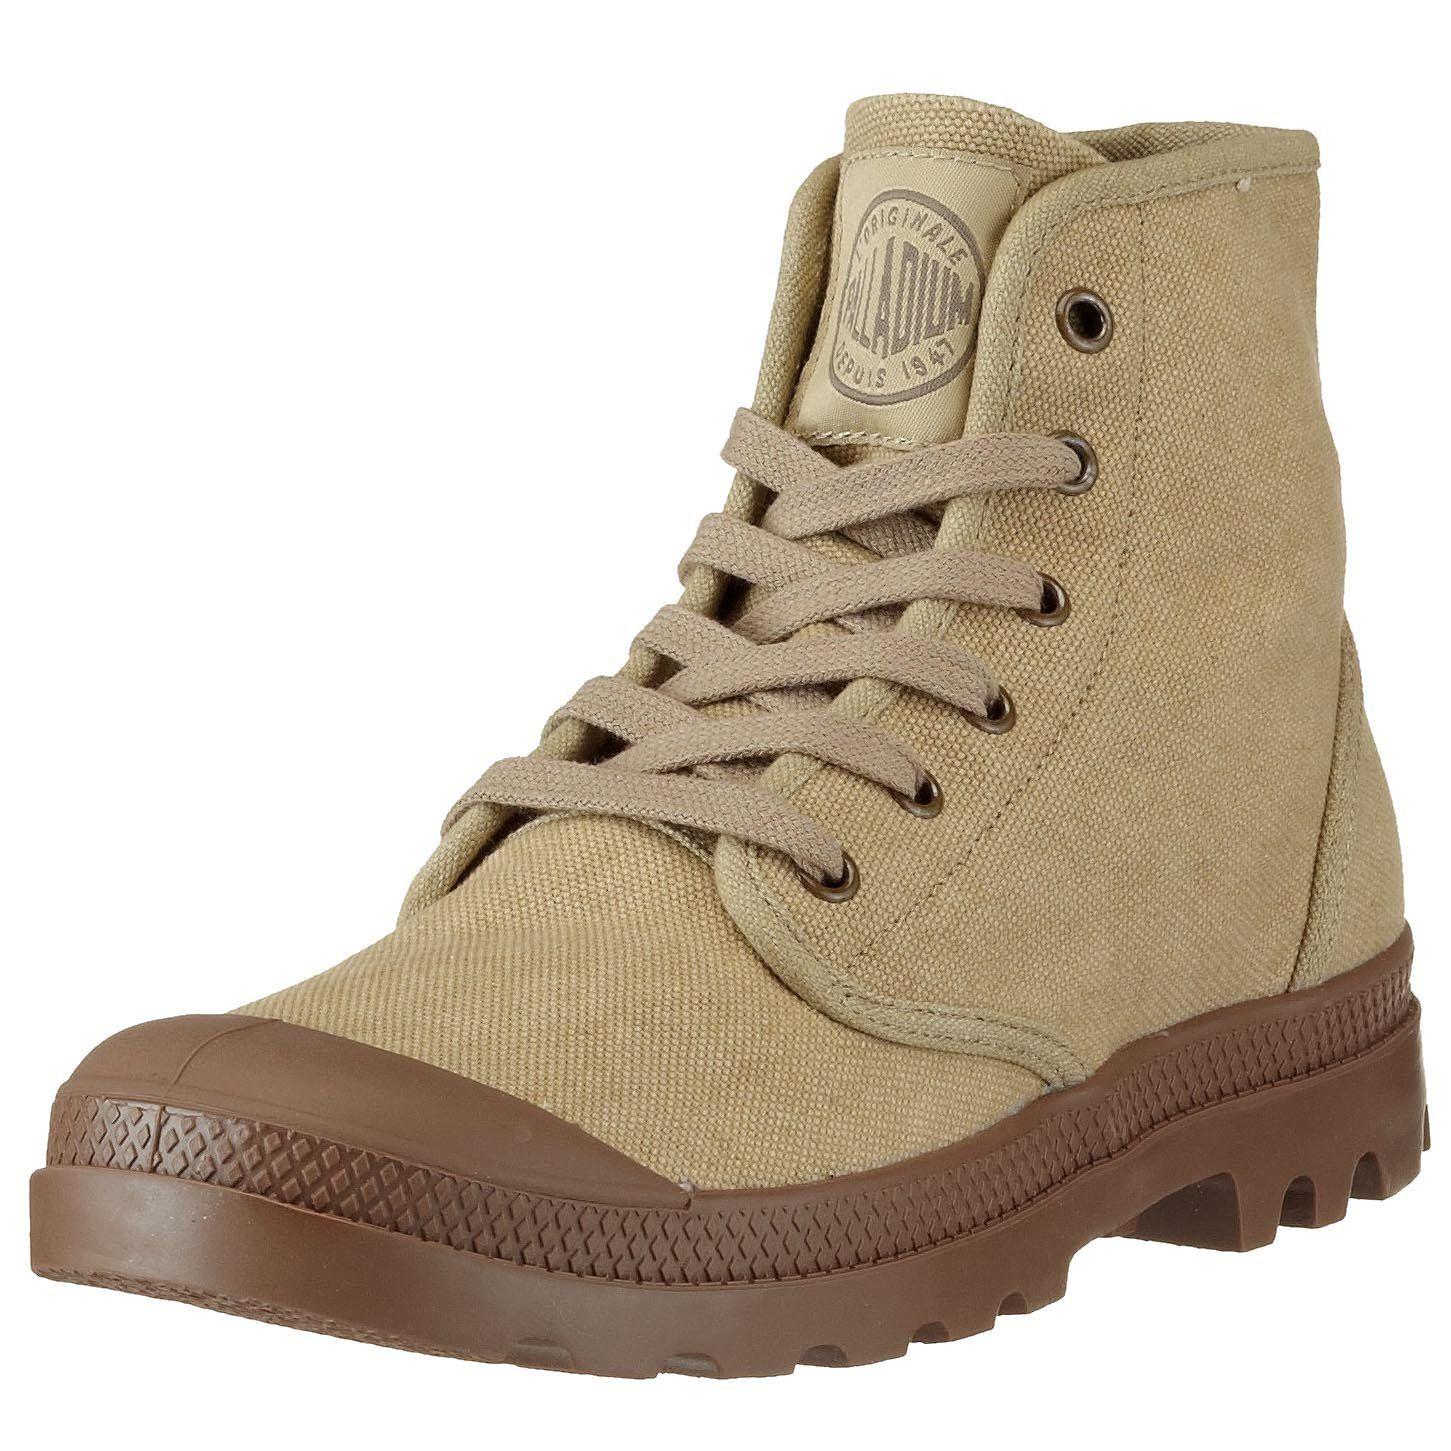 19b91d3f1ba3 Amazon.com  Palladium Men s Pampa Hi Boot  Shoes. Supposedly